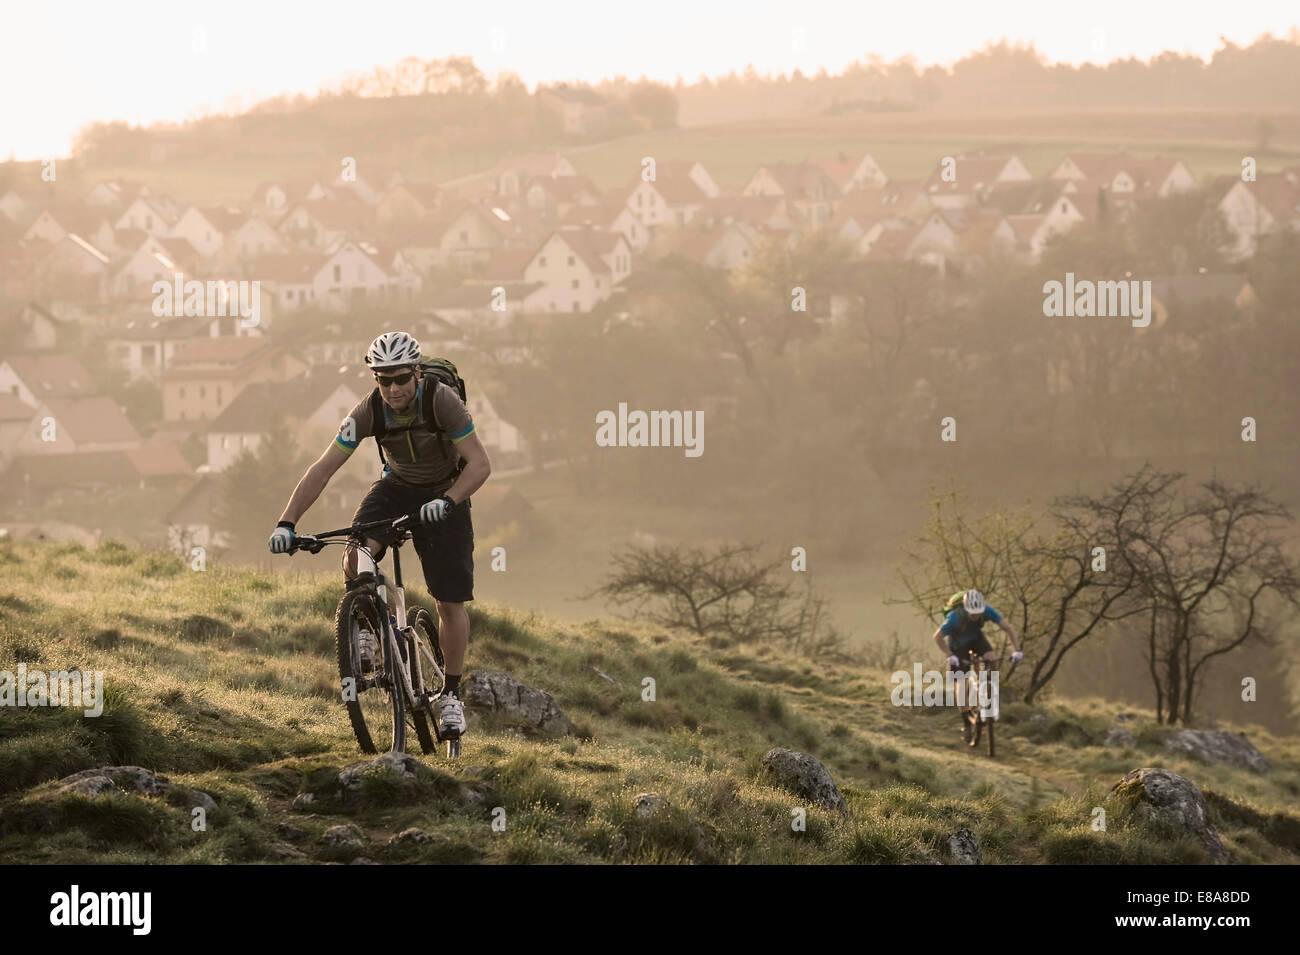 Junge Männer Mountainbiken bei Sonnenaufgang, Bayern, Germany Stockbild